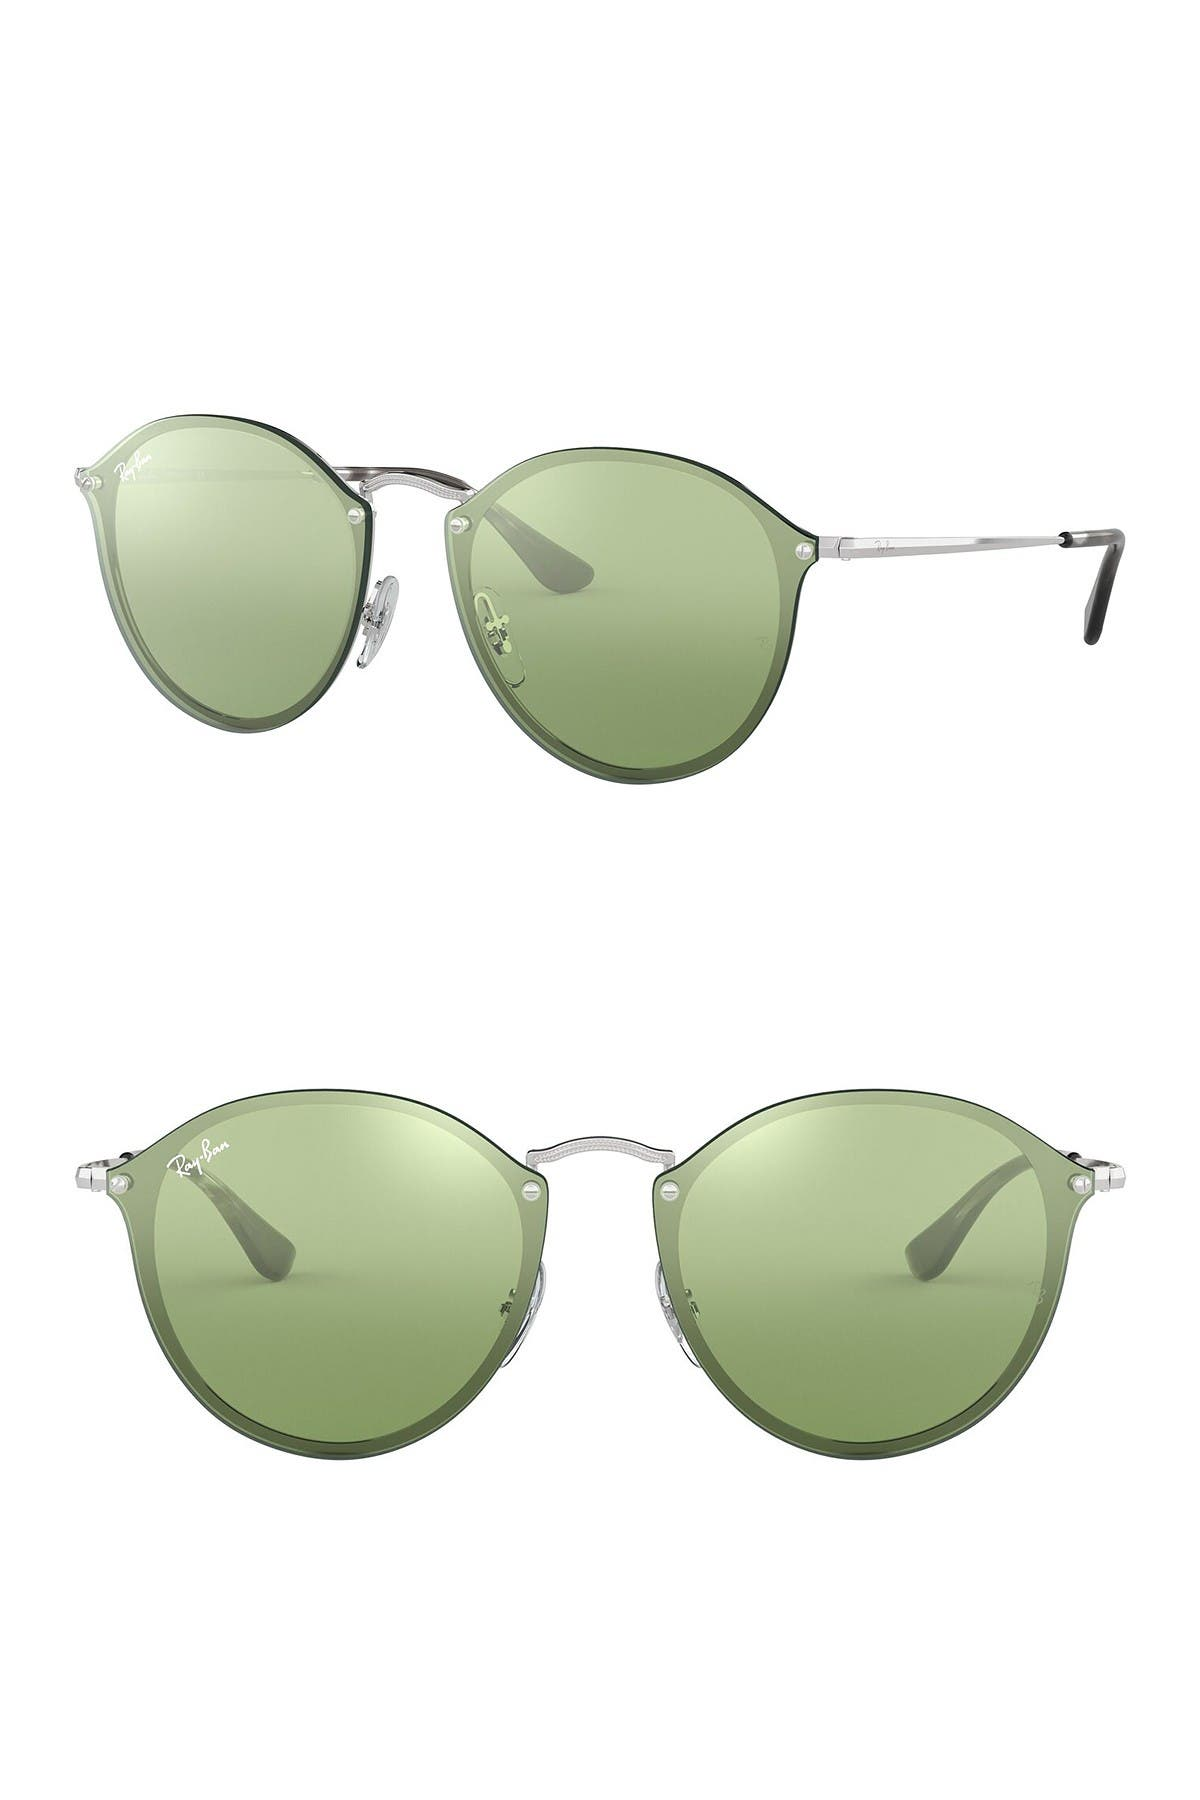 Image of Ray-Ban 59mm Blaze Round Mirrored Sunglasses